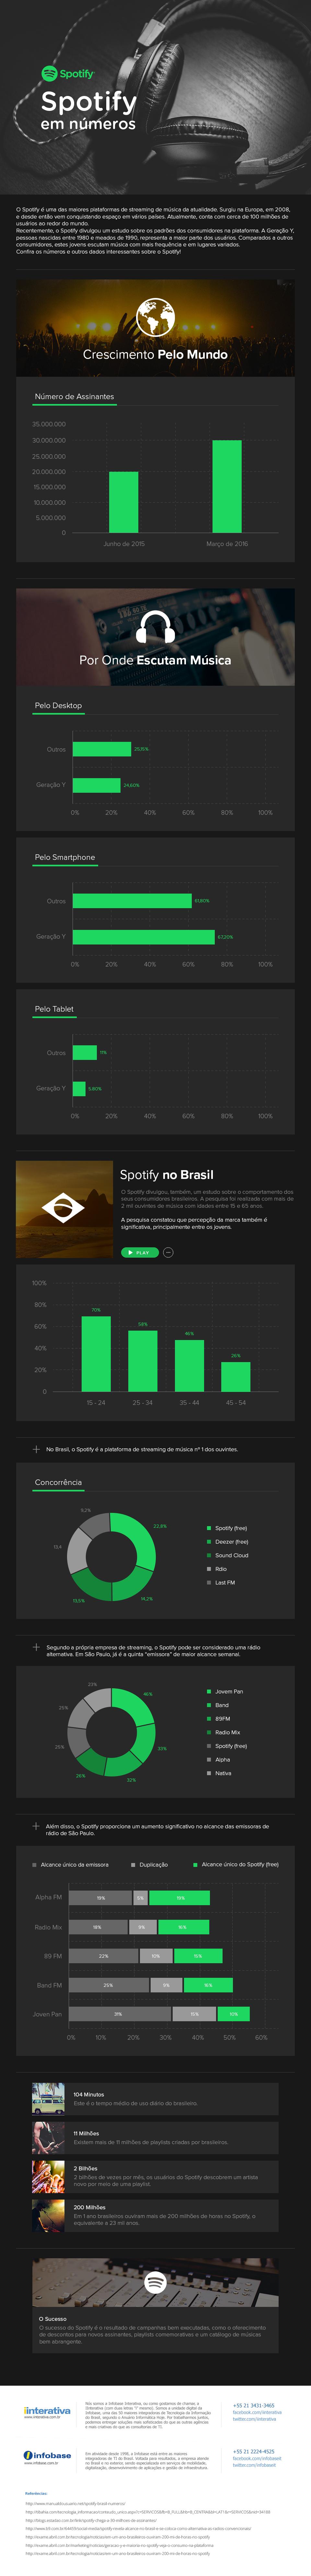 spotify-infografico